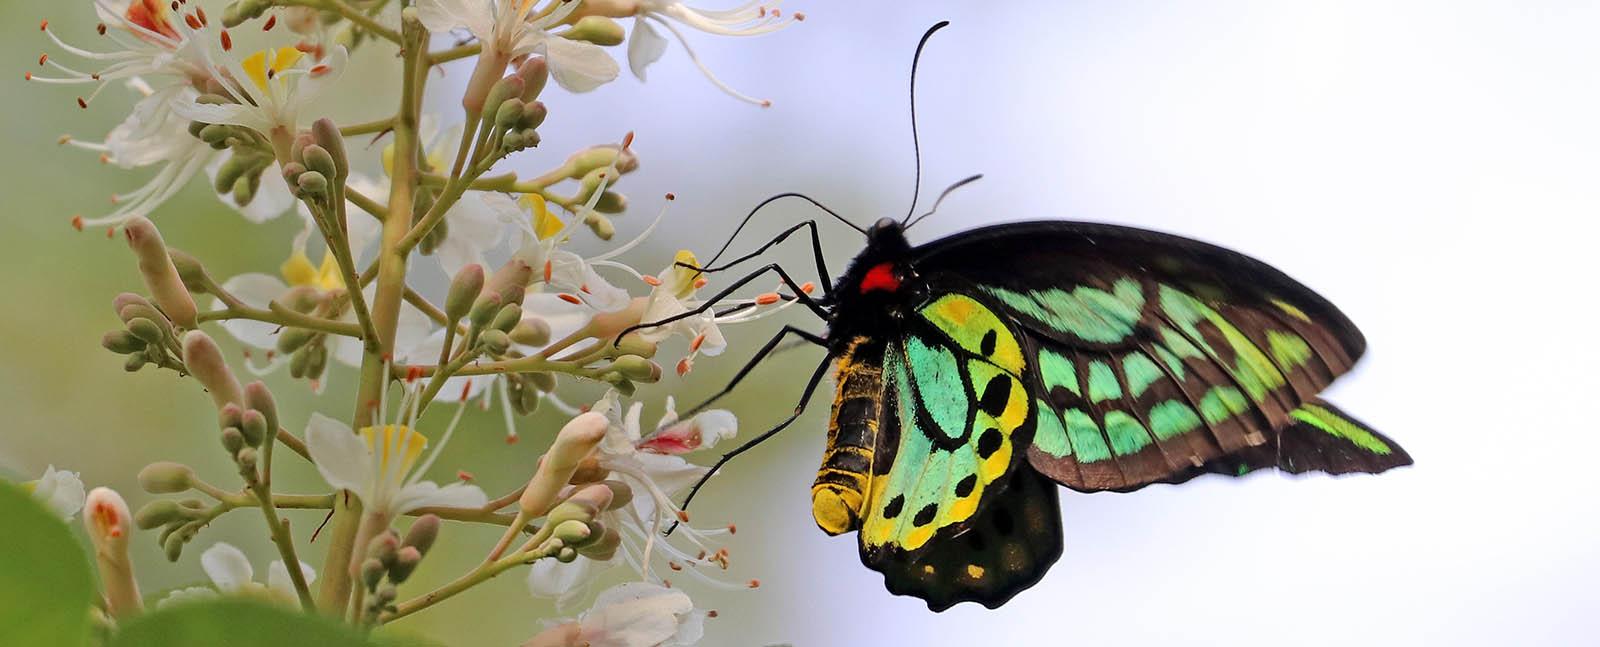 Richmond Birdwing Butterfly (image by Damon Ramsey)